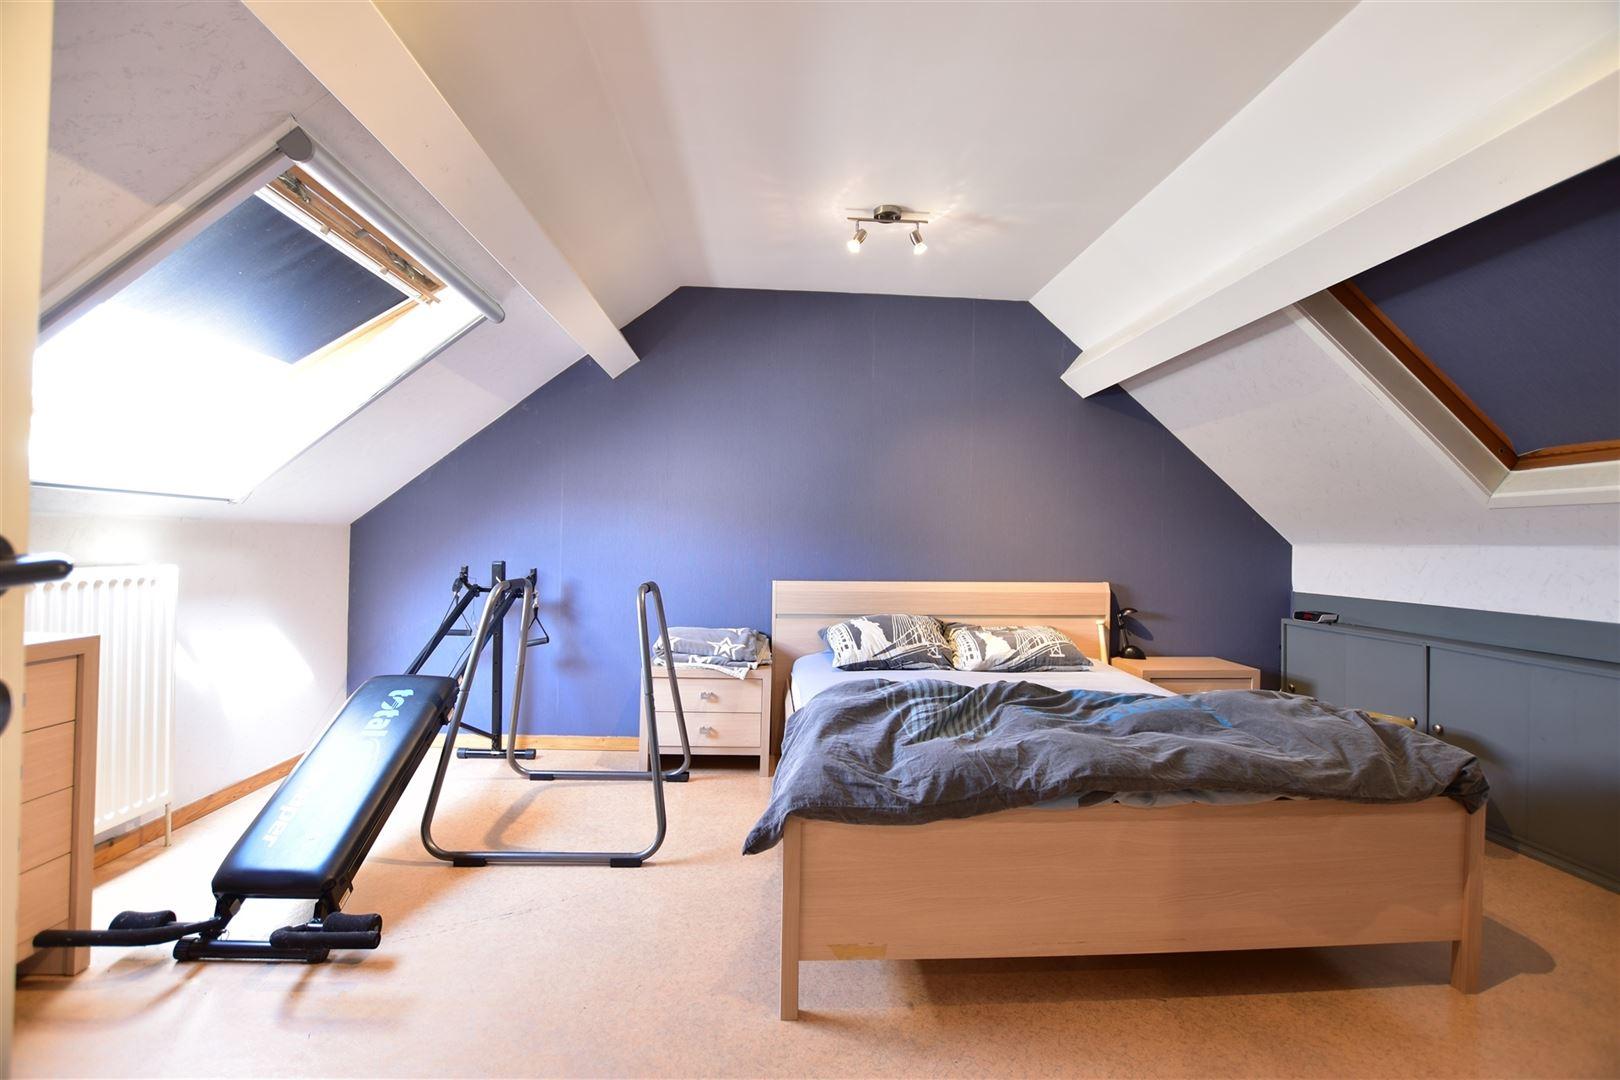 Foto 11 : Duplex/triplex te 9200 BAASRODE (België) - Prijs € 159.000